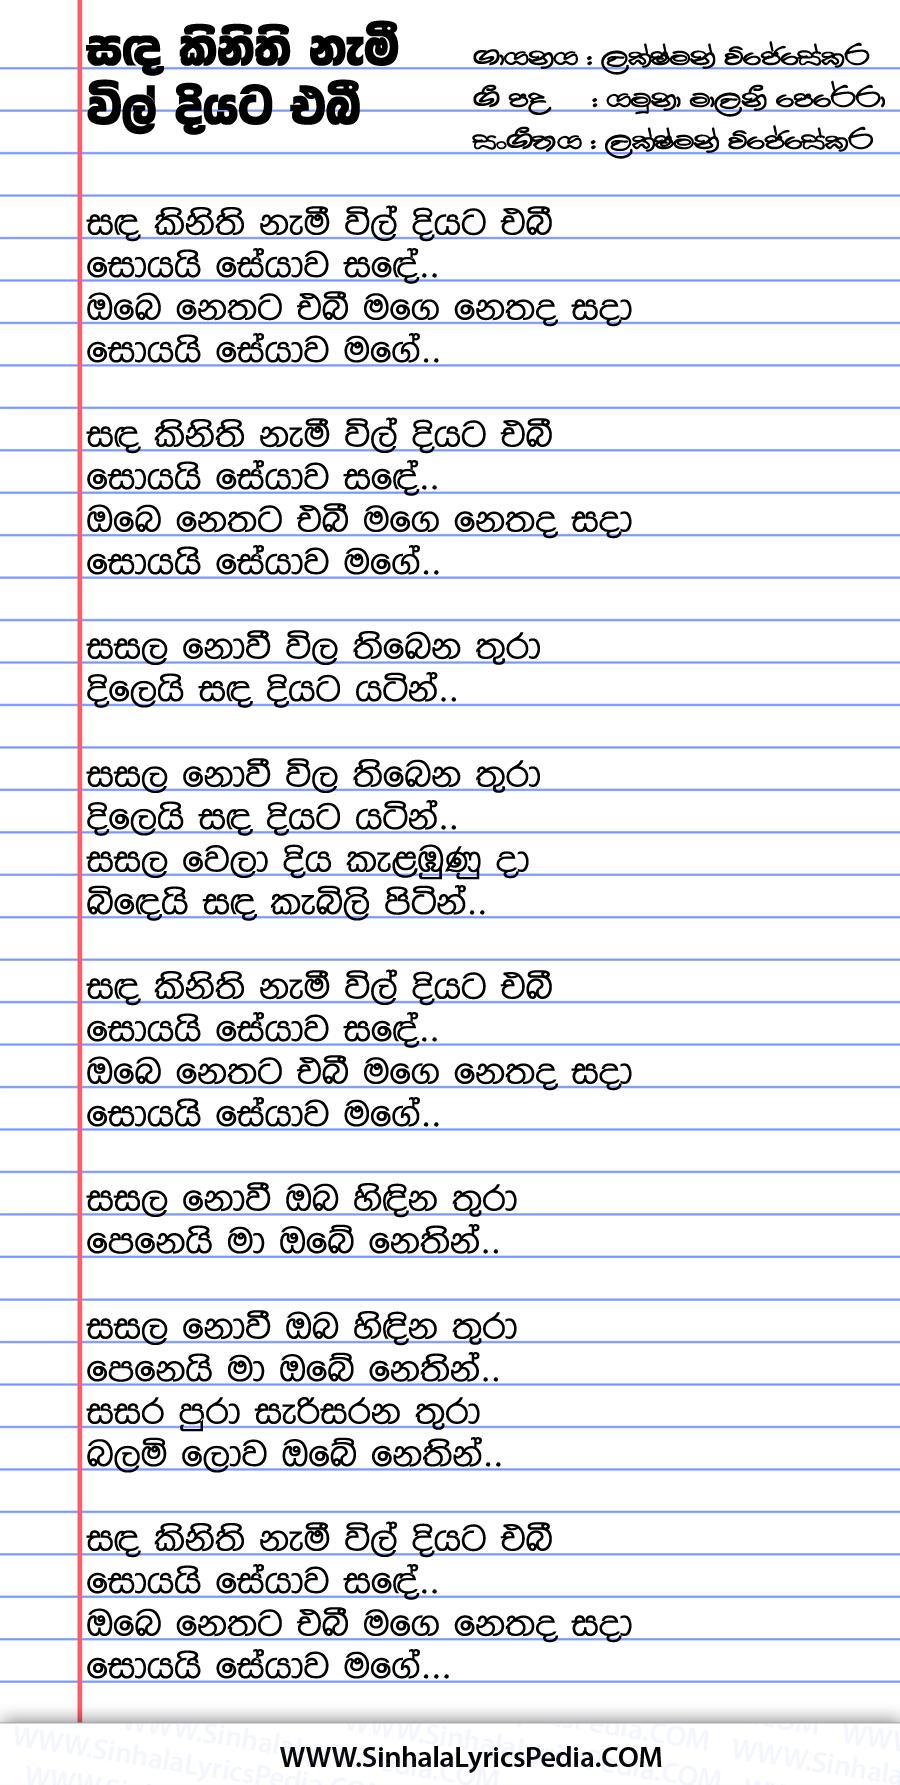 Sanda Kinithi Nami Vil Diyata Ebi Song Lyrics